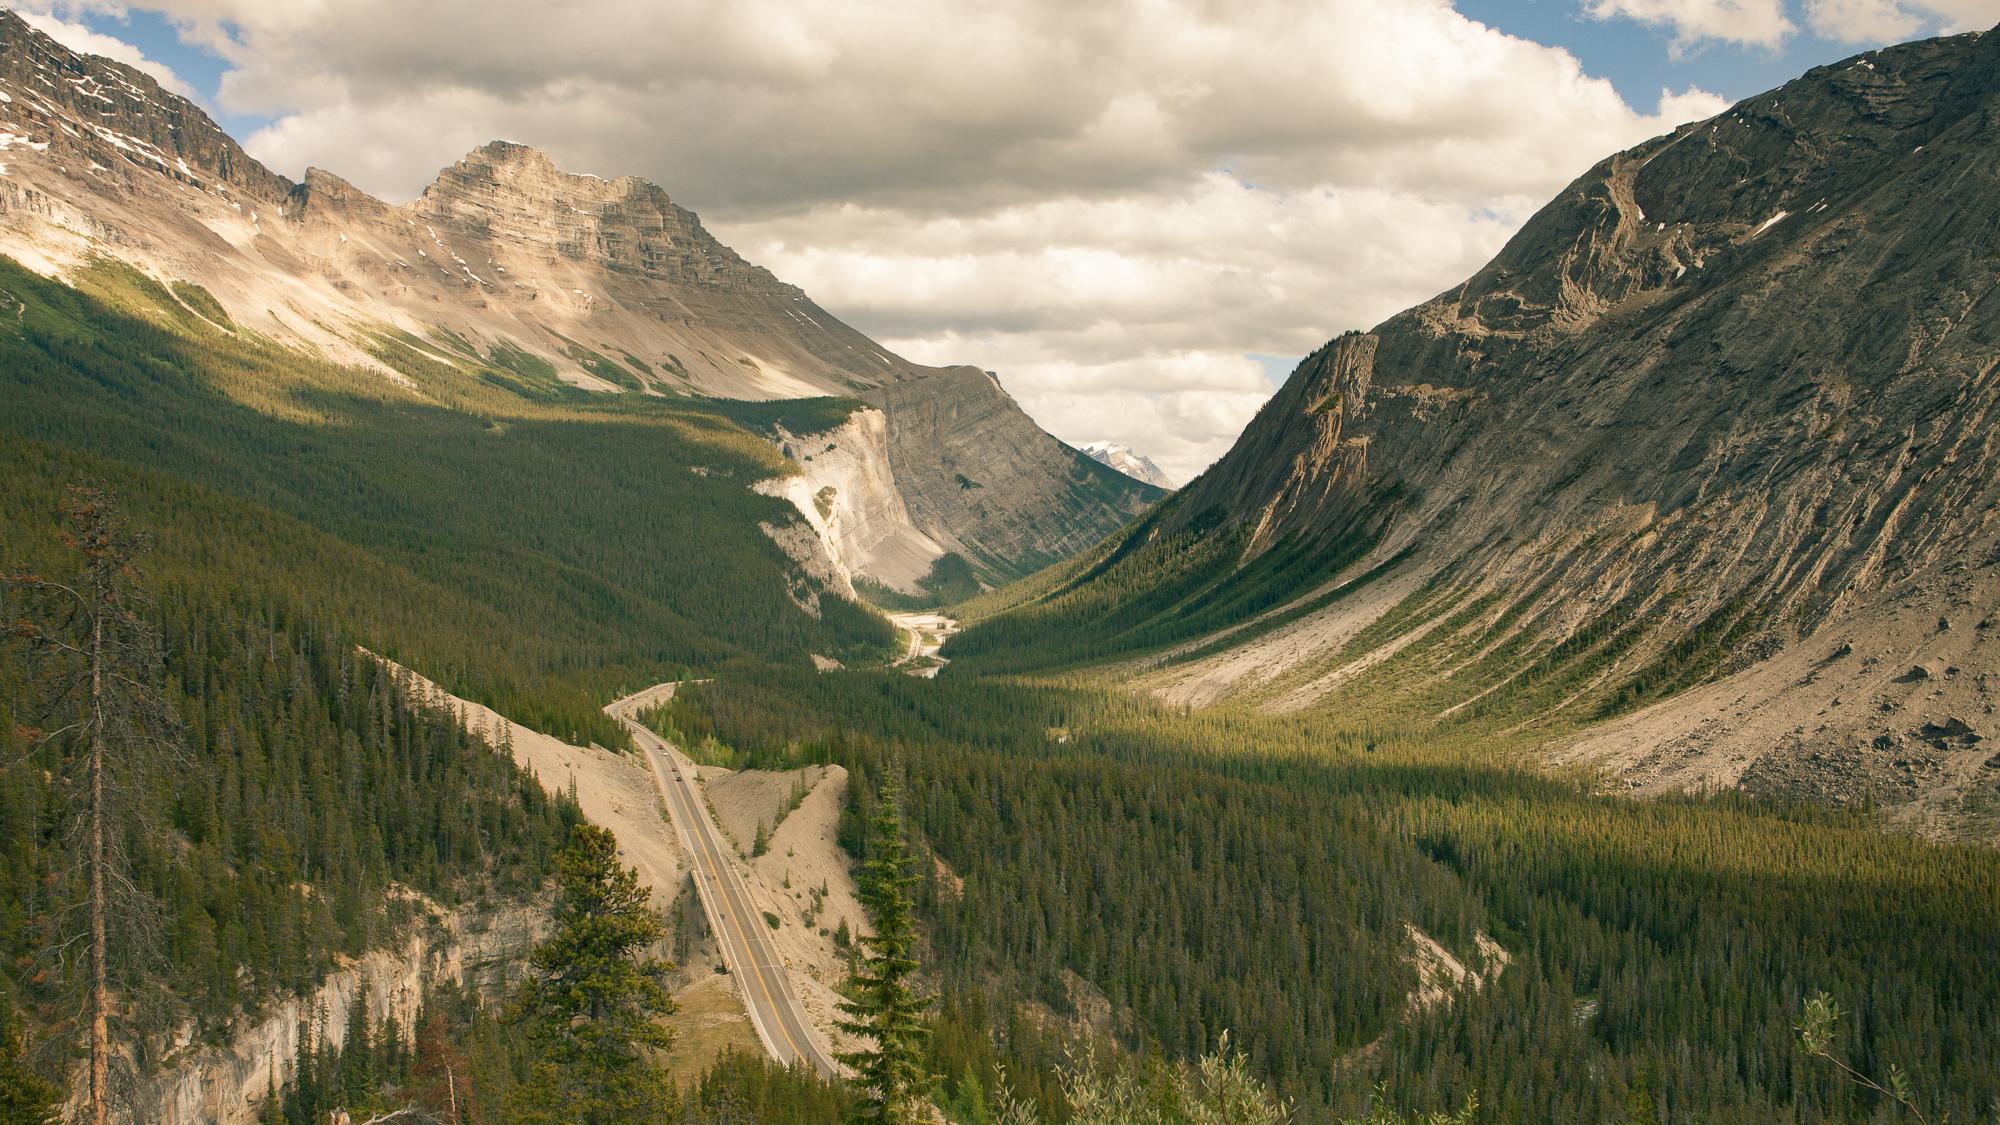 Icefield Parkway, Canadian Rockies